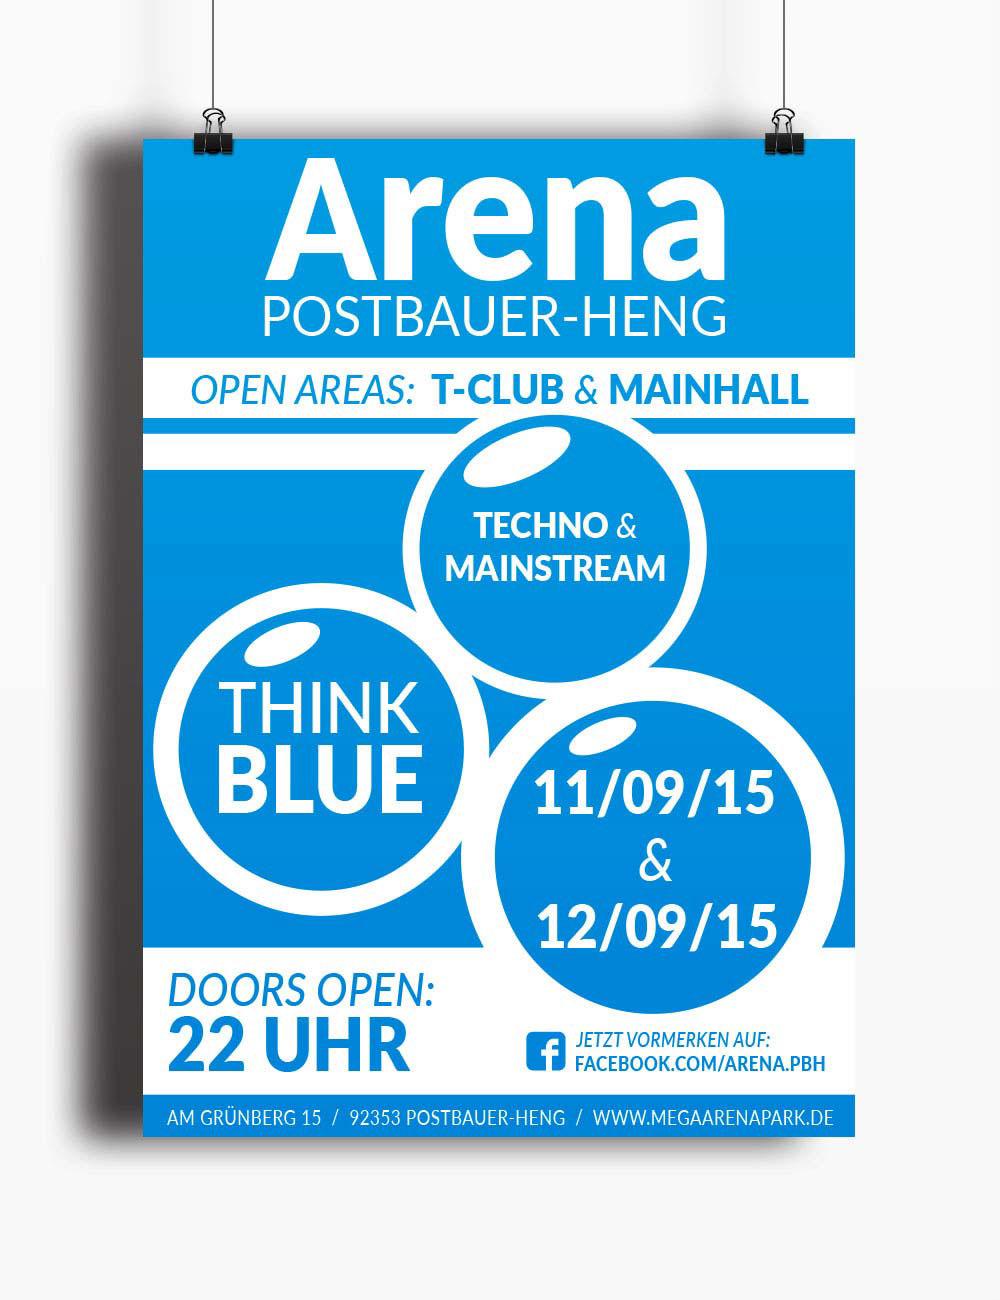 Grafikdesign Plakatgestaltung Arena Postbauer Heng On Behance